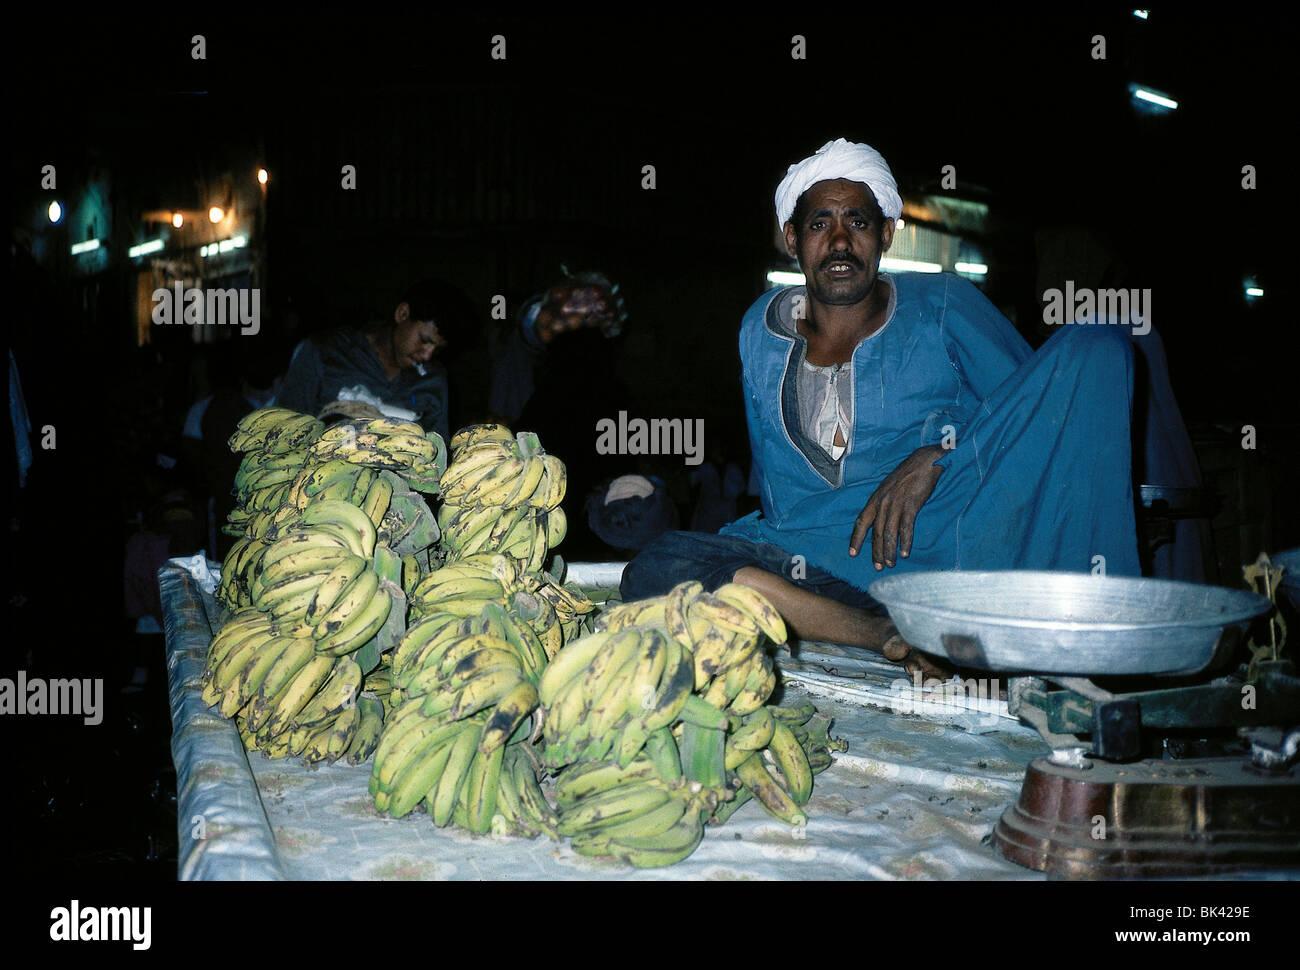 Merchant selling bananas, Egypt - Stock Image